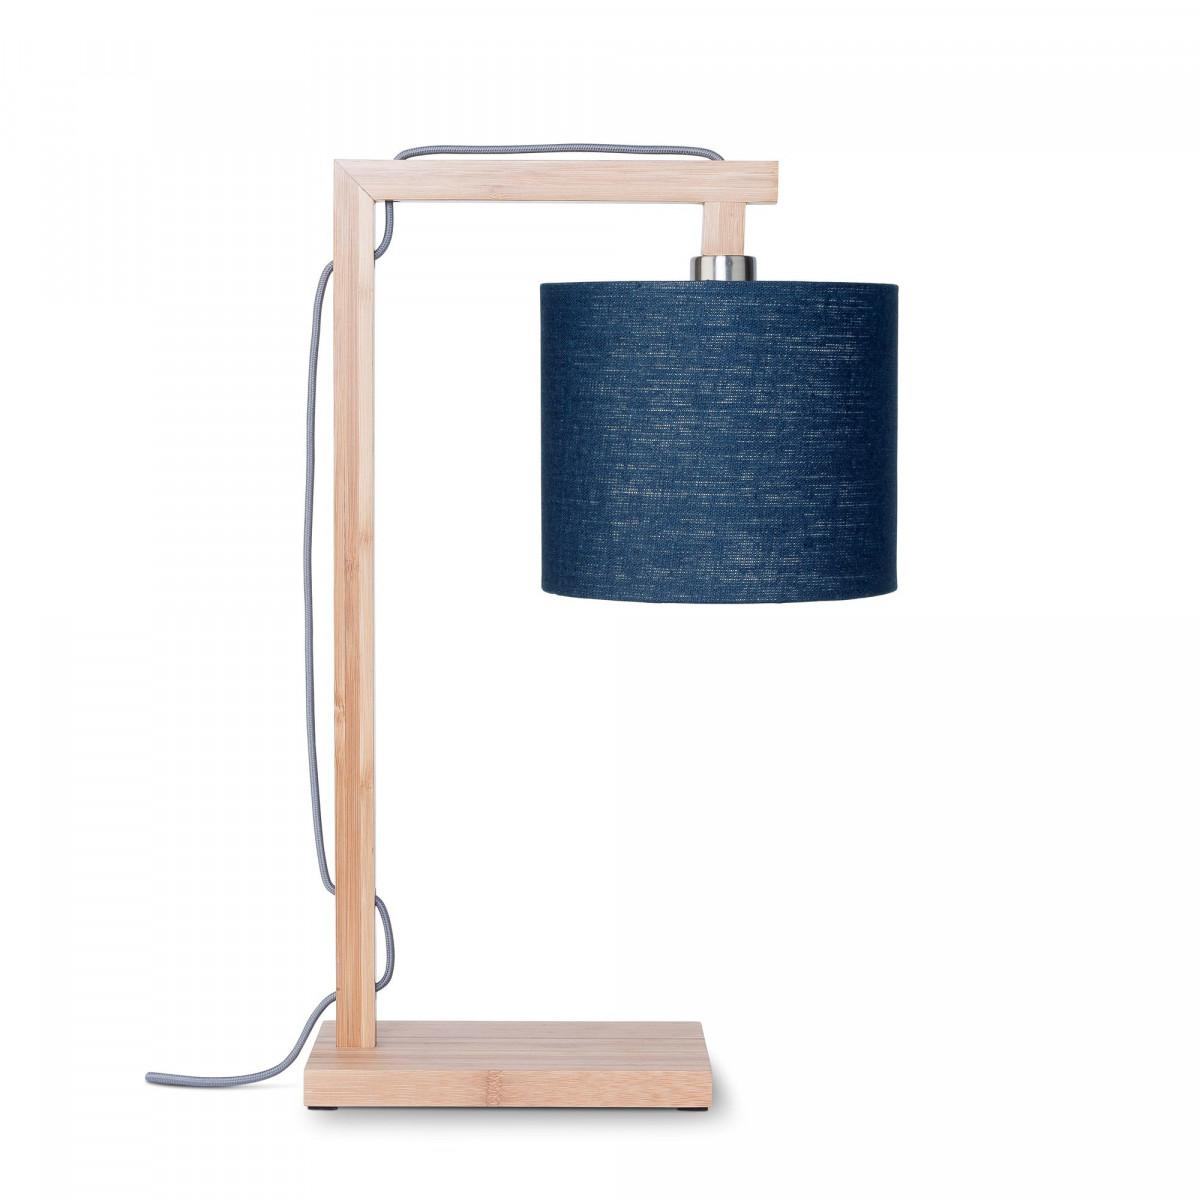 Lampe de table Himalaya en lin et bambou Bleu denimw